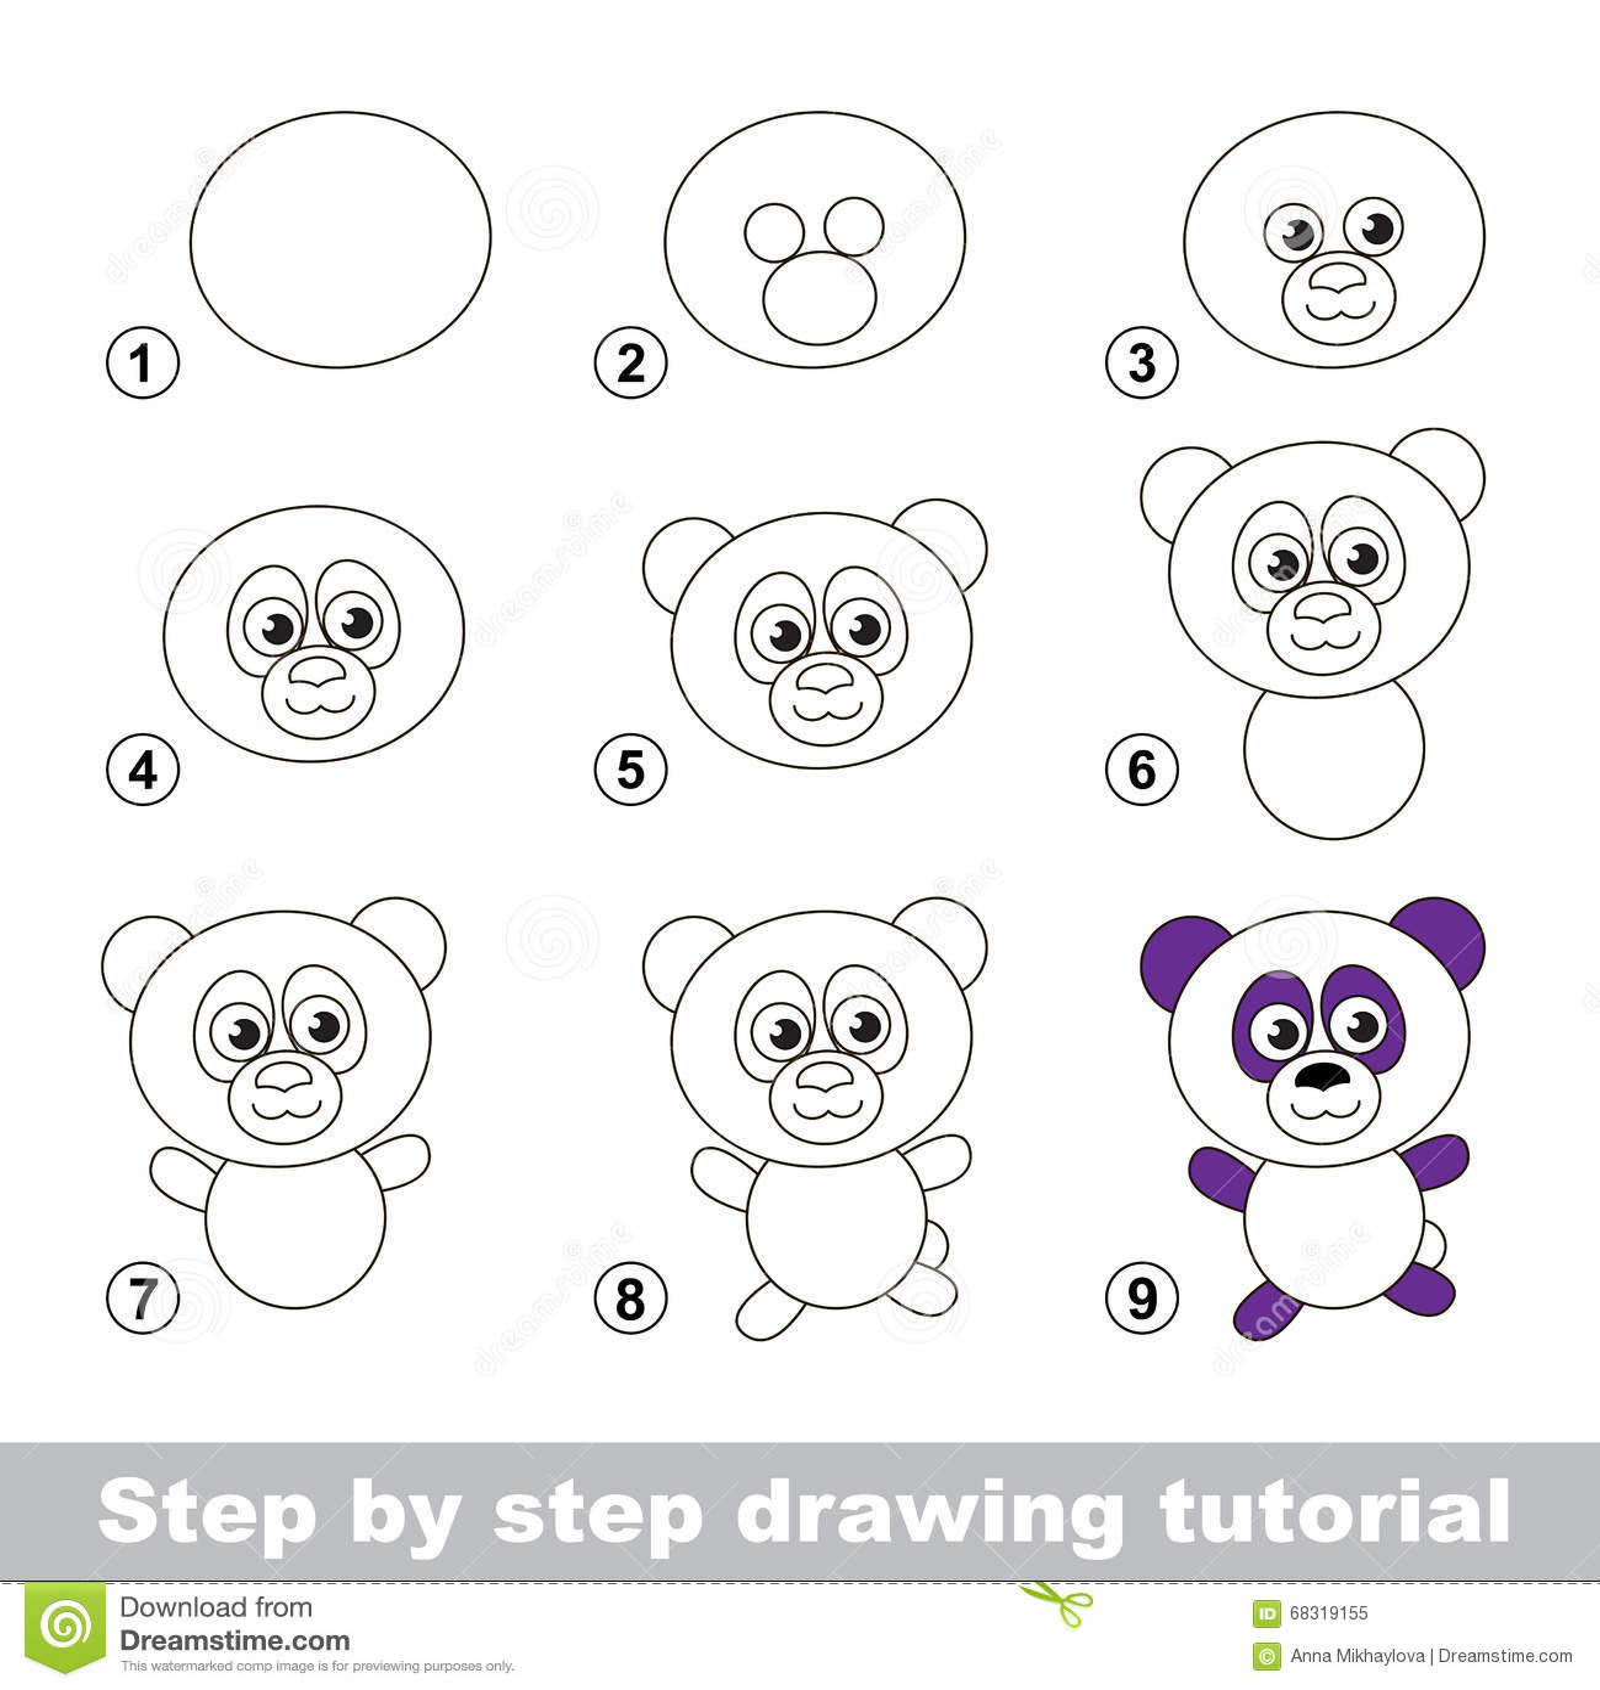 Tutorial Del Dibujo Como Dibujar Una Panda Ilustracion Del